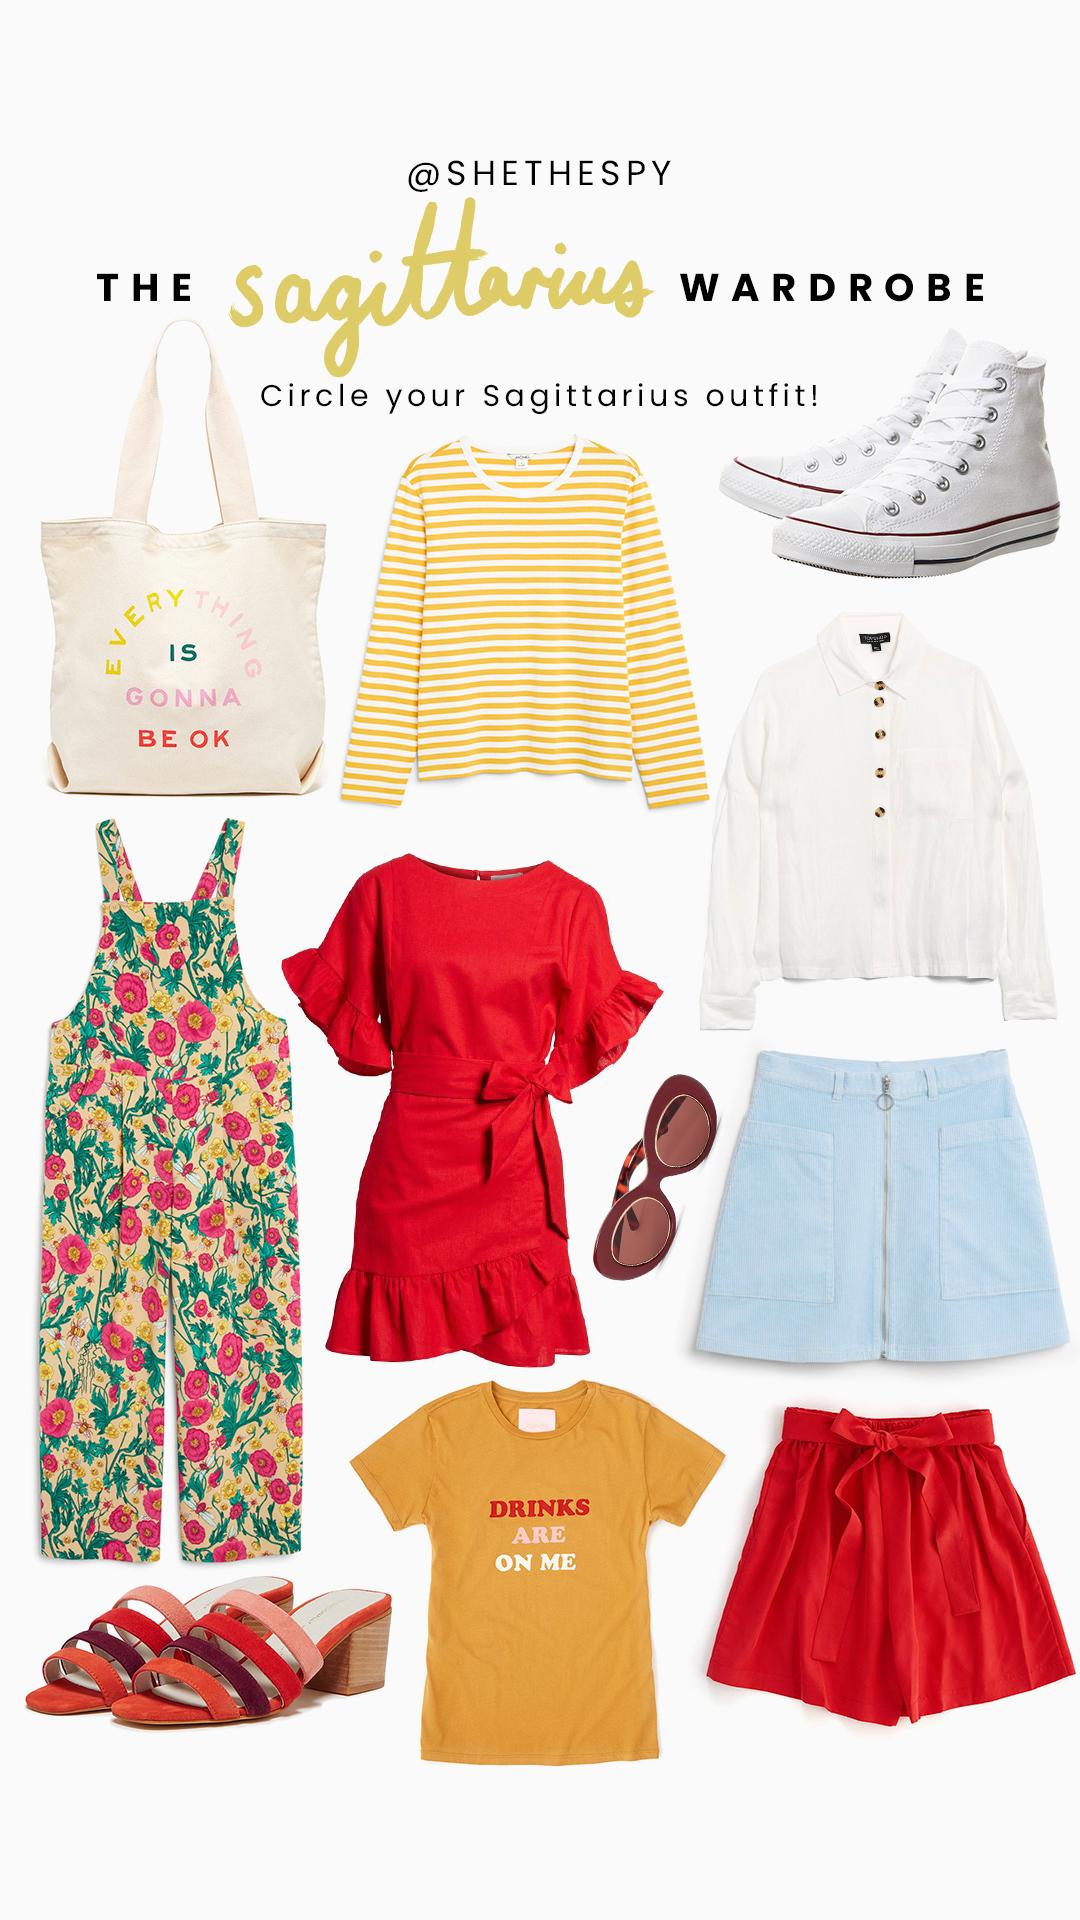 Shop Sagittarius - Bag: BandoStripe top: MonkiShoes: ConverseJumpsuit: MonkiDress: SocialiteShirt: TopshopSunglasses: BandoSkirt: MonkiTee: BandoShorts: BandoHeels: Bando